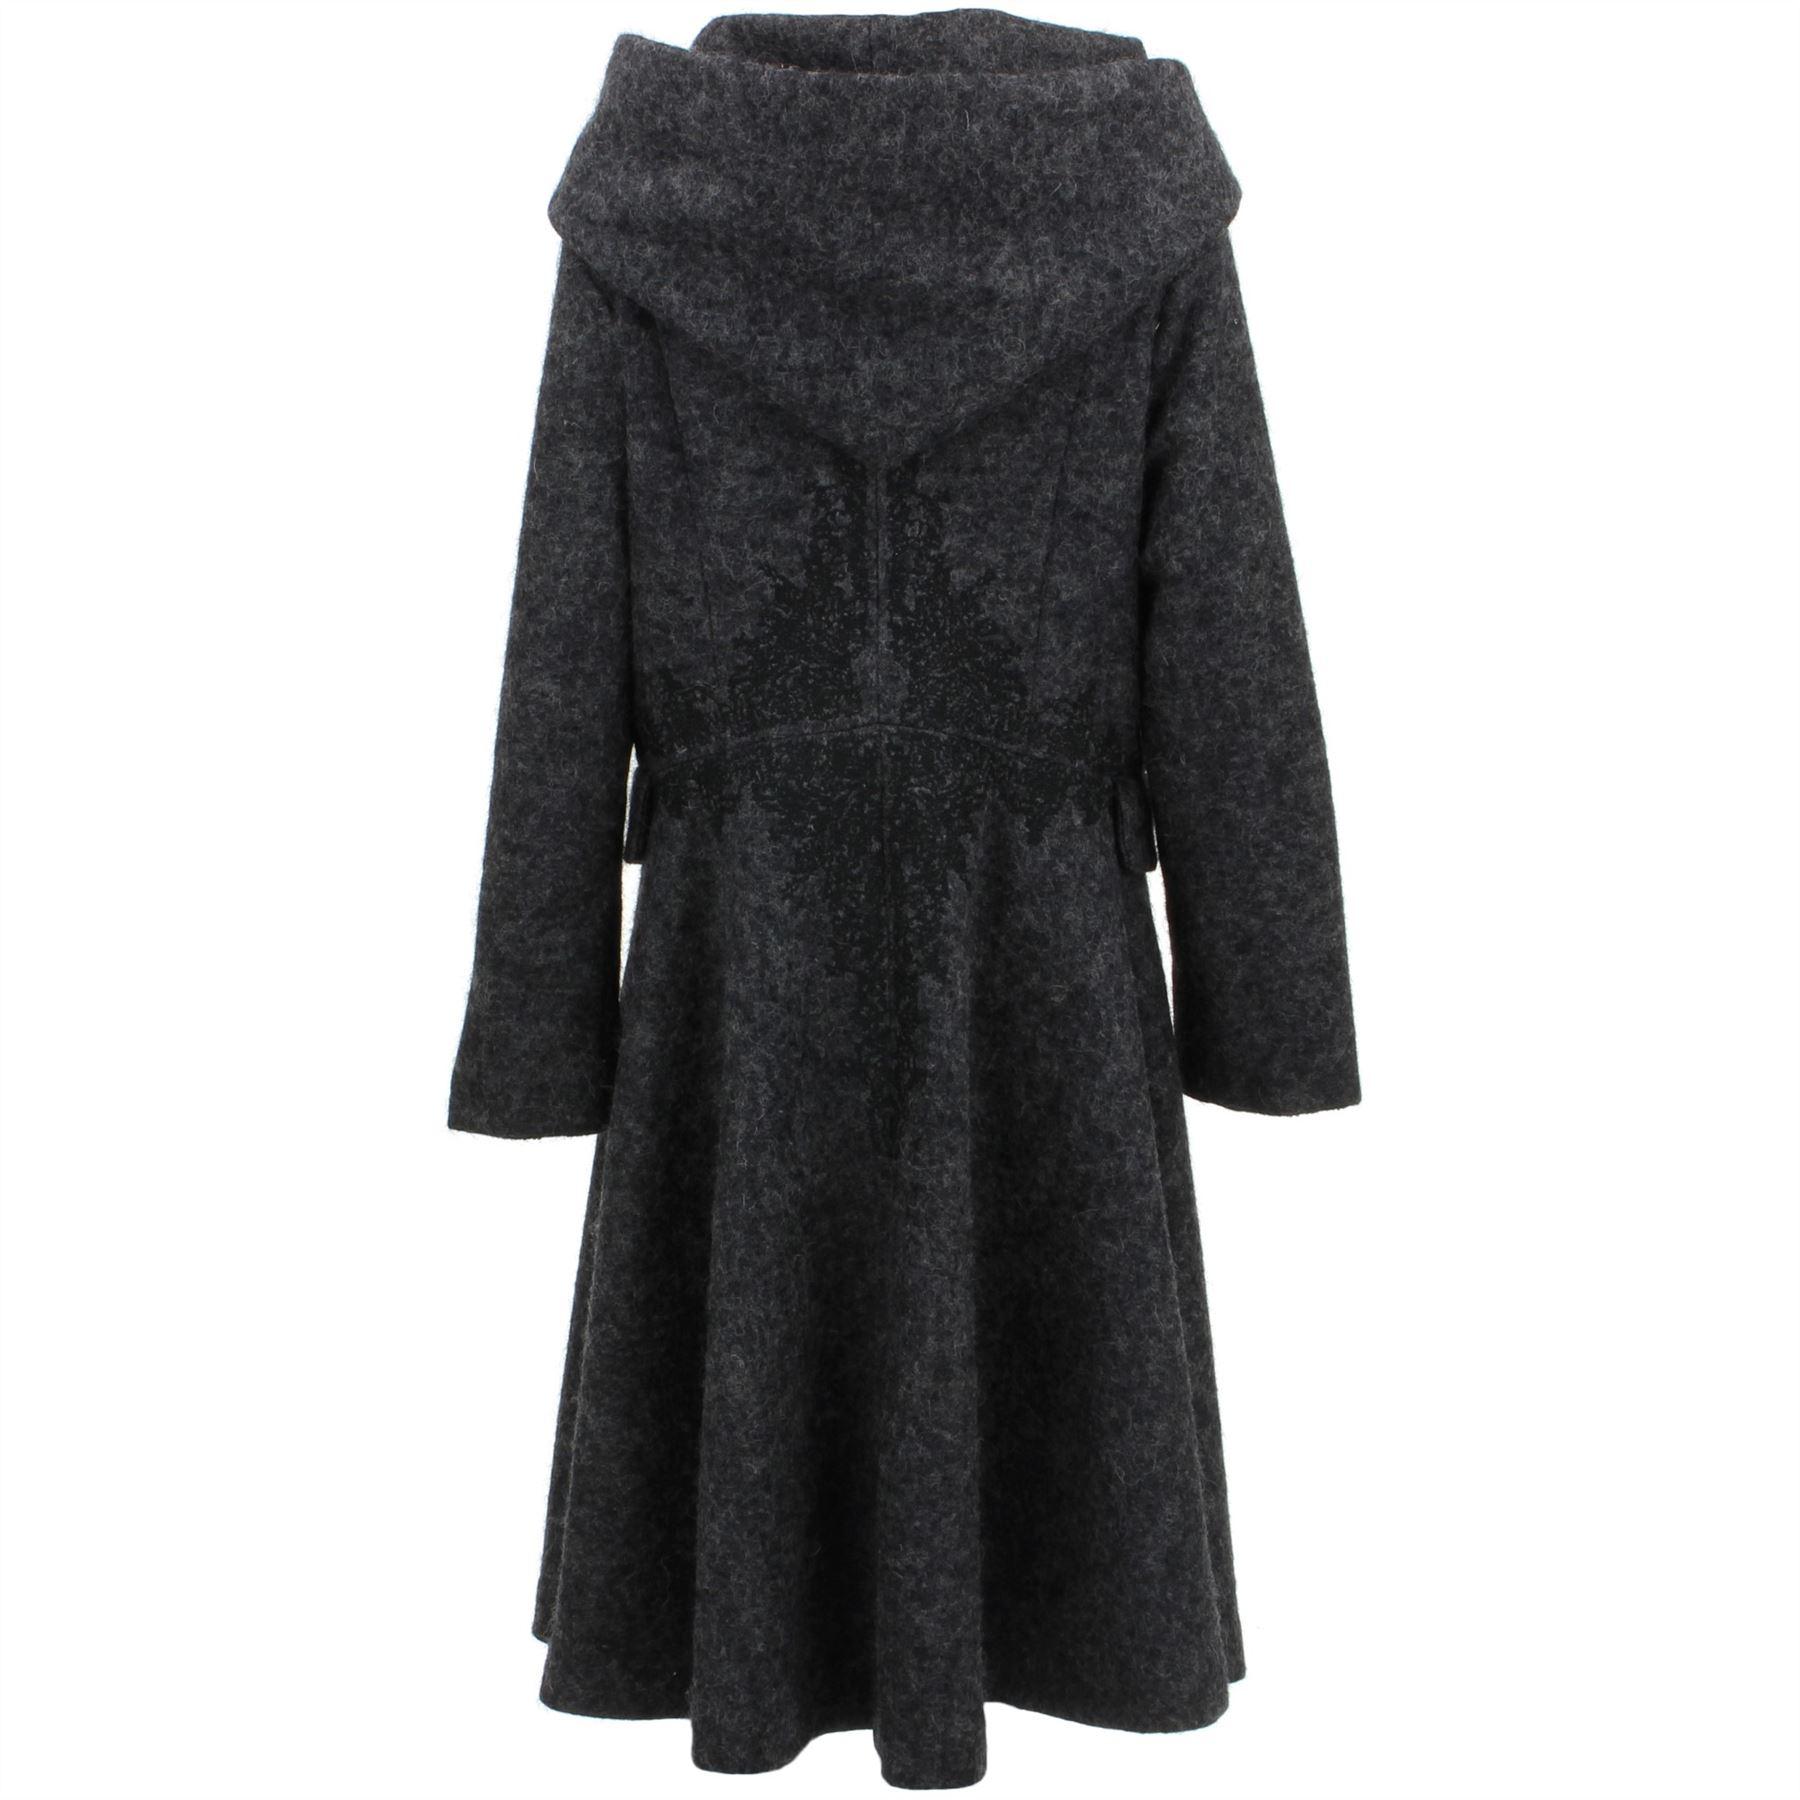 Ladies-Wool-Winter-Coat-Jacket-BOHEMIA-SWEDEN-Woven-Wool-rich-blend-Hood thumbnail 3